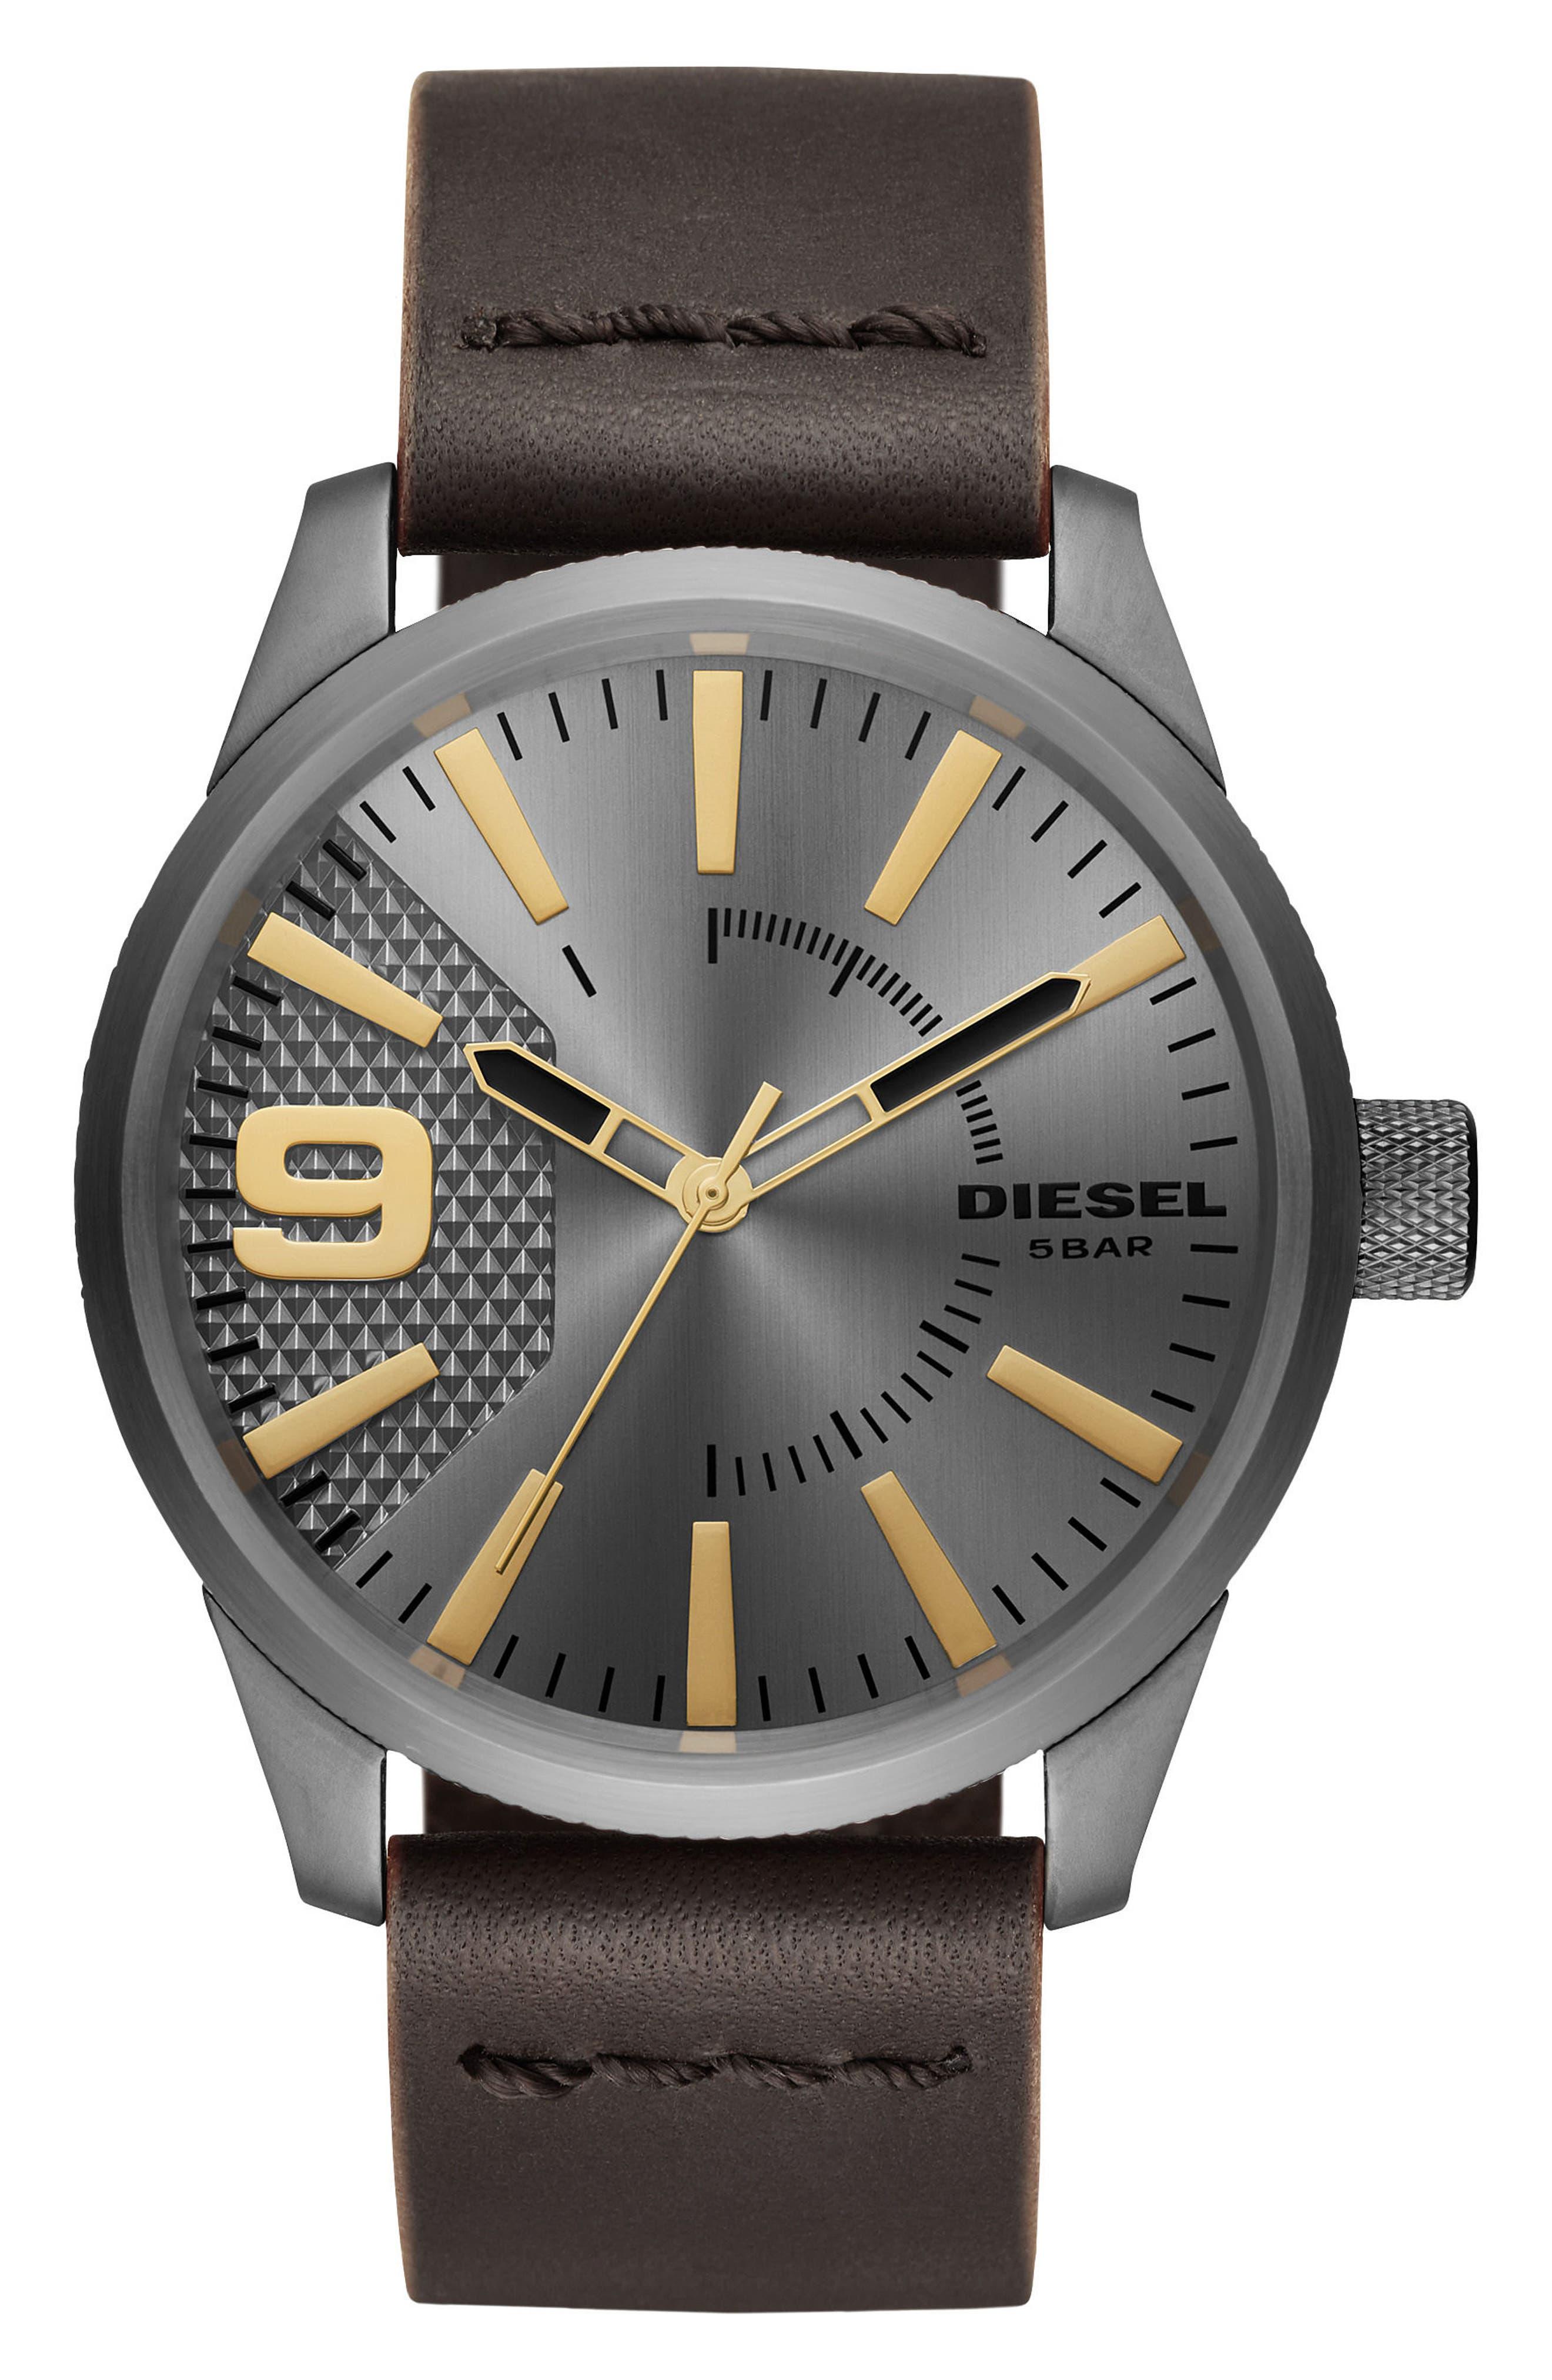 DIESEL® Rasp Leather Strap Watch, 46mm x 53mm